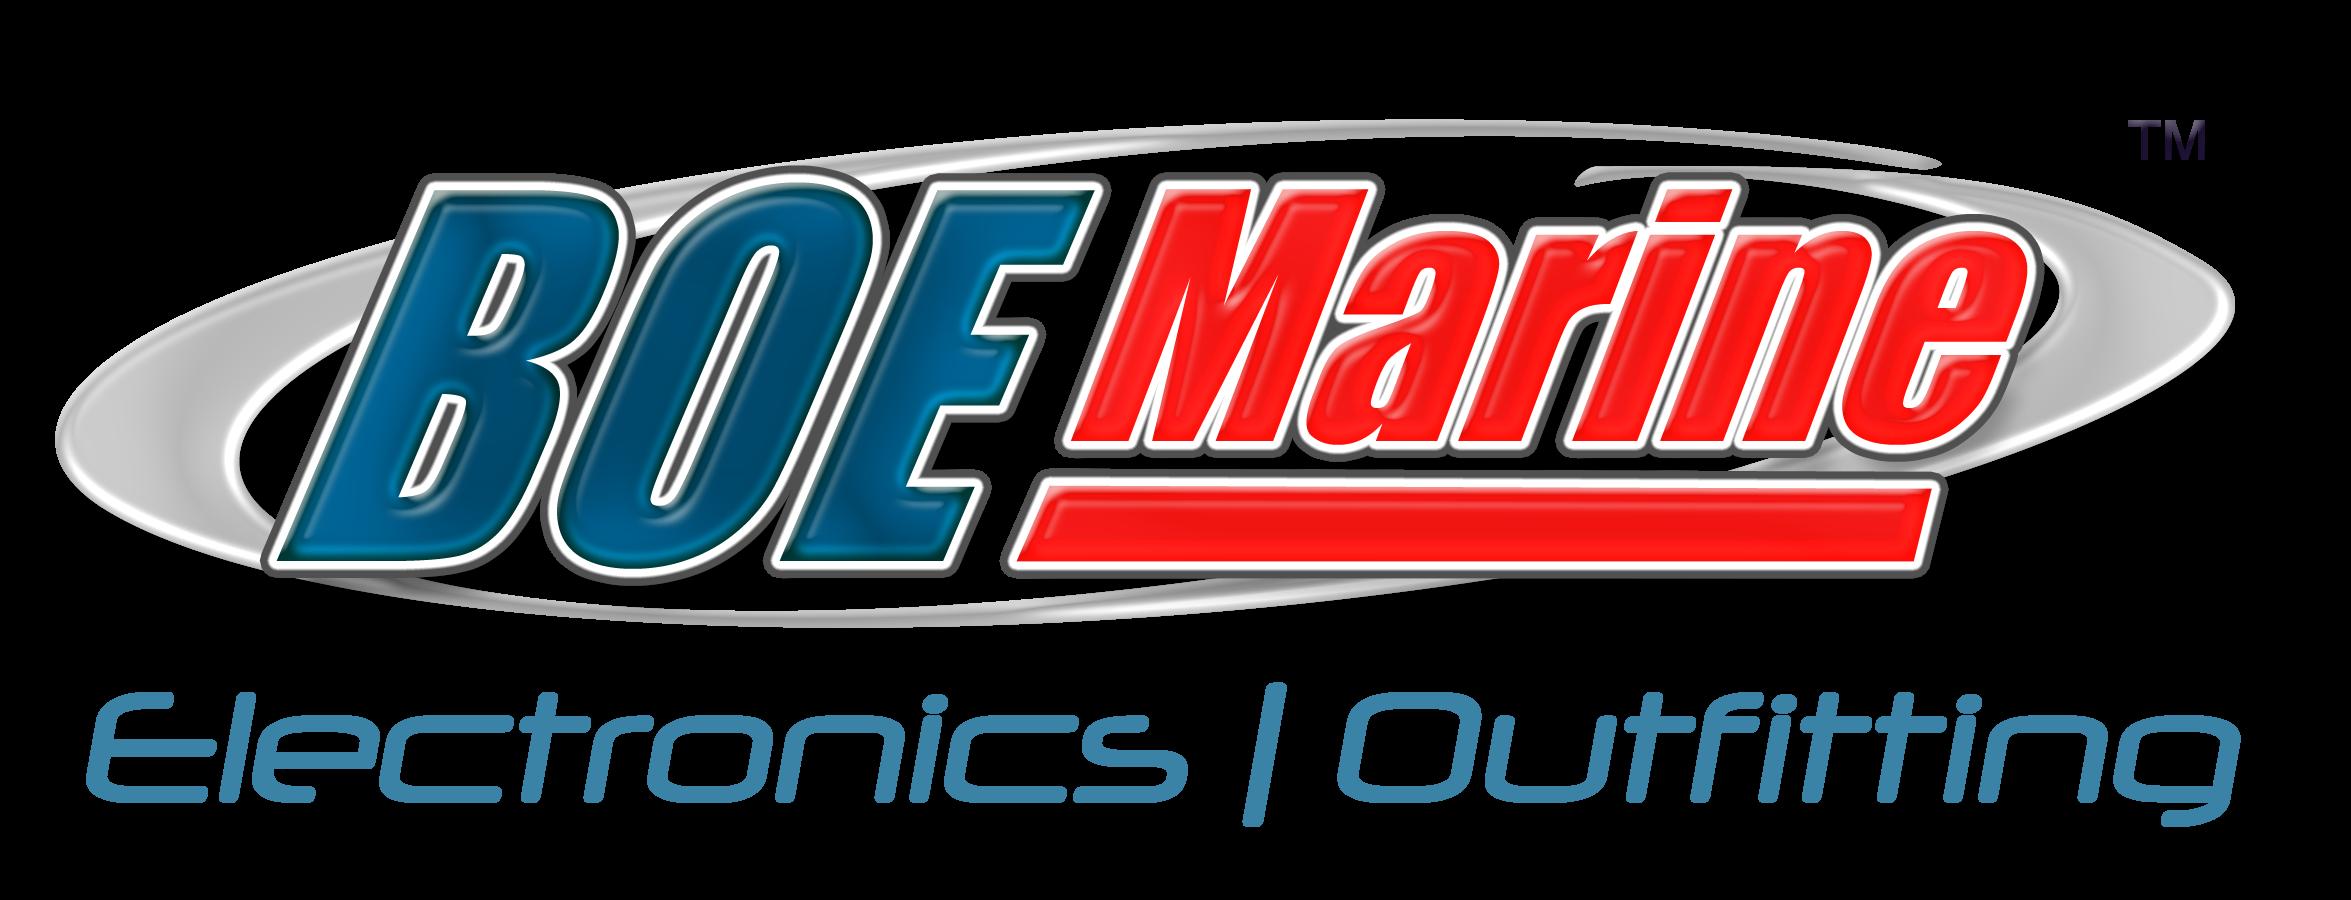 BOE Marine Logo